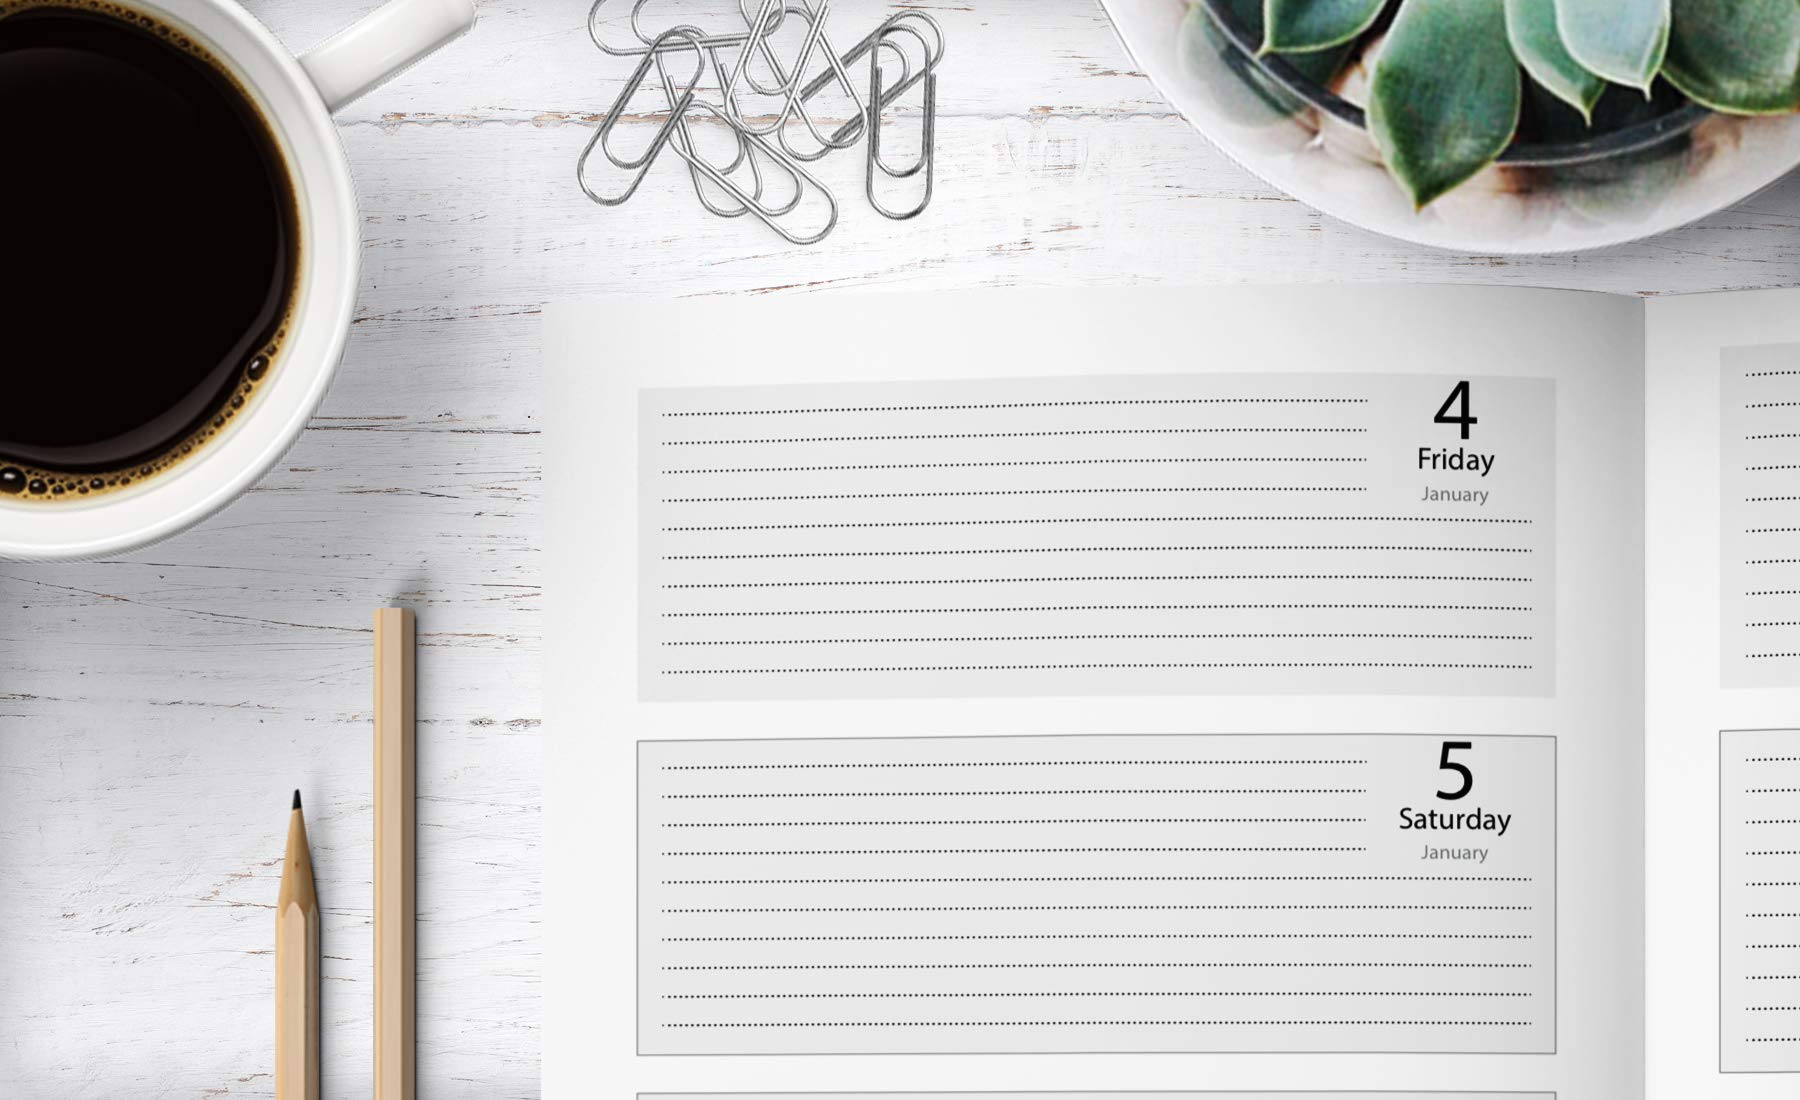 Weekly Planner 2019: Weekly Planner, Calendar and Schedule ...